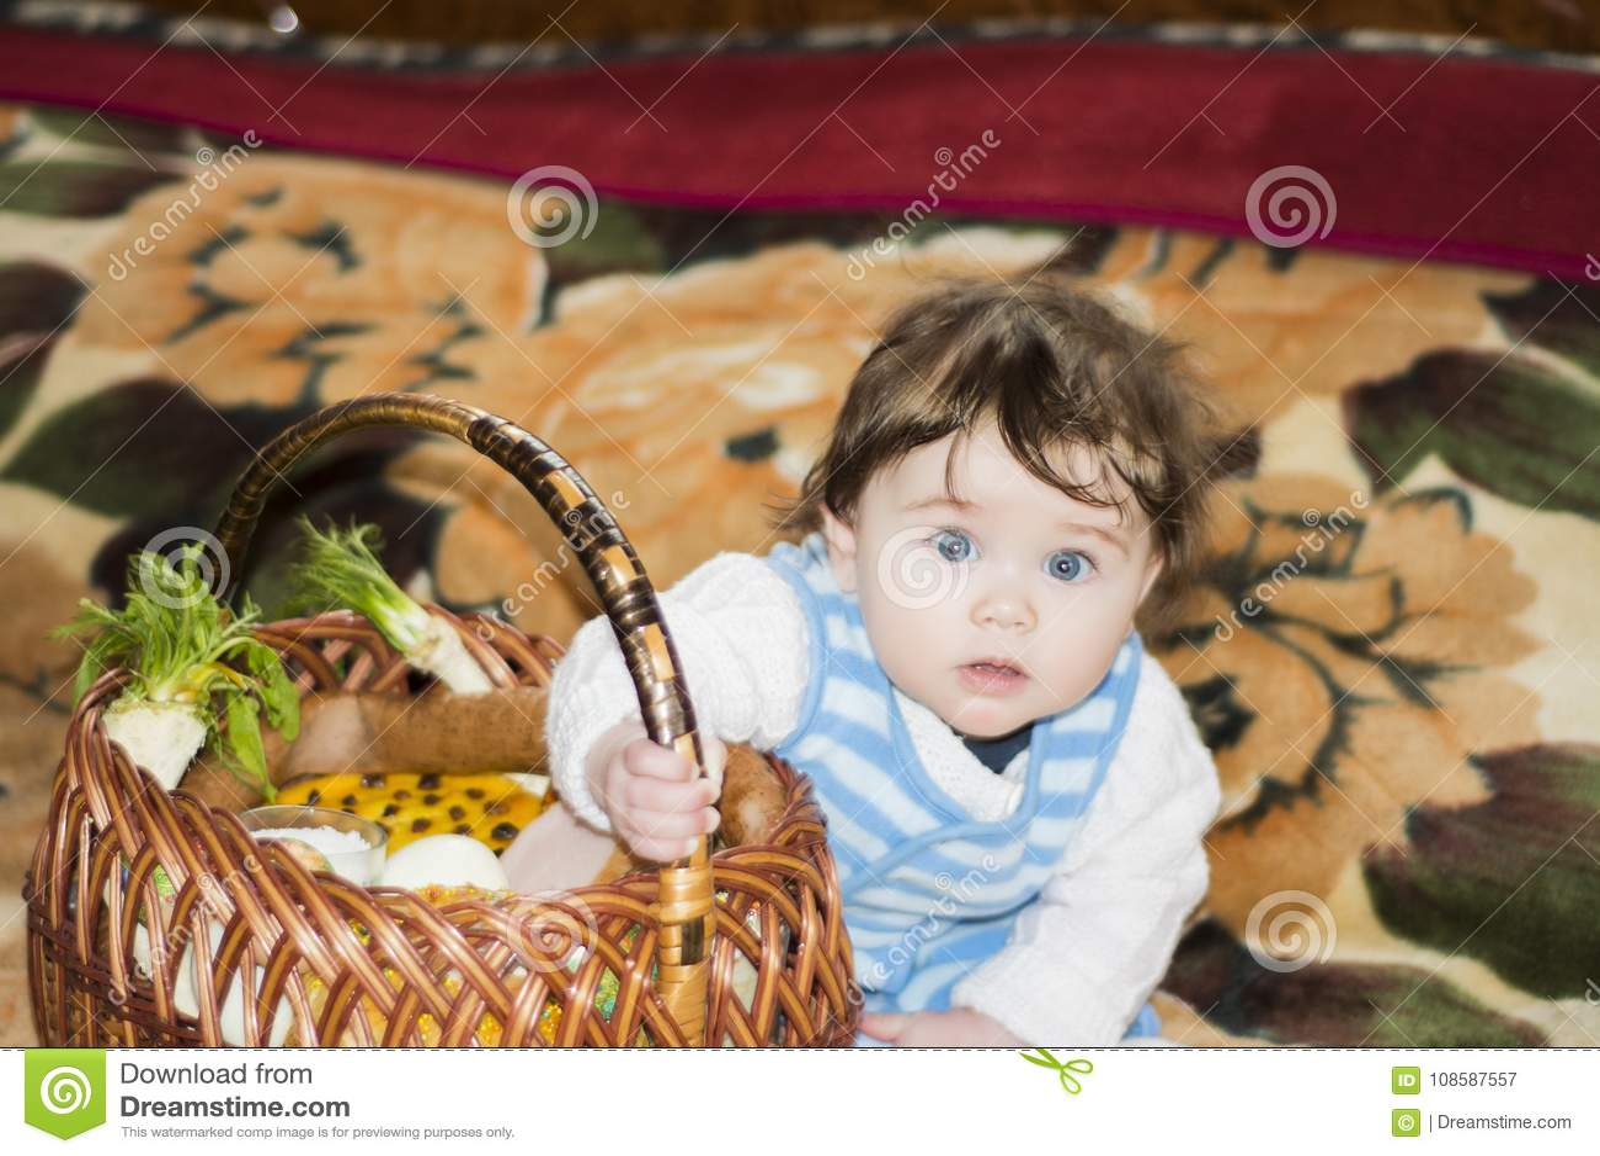 fille jouir sur fille mère fille grosse bite